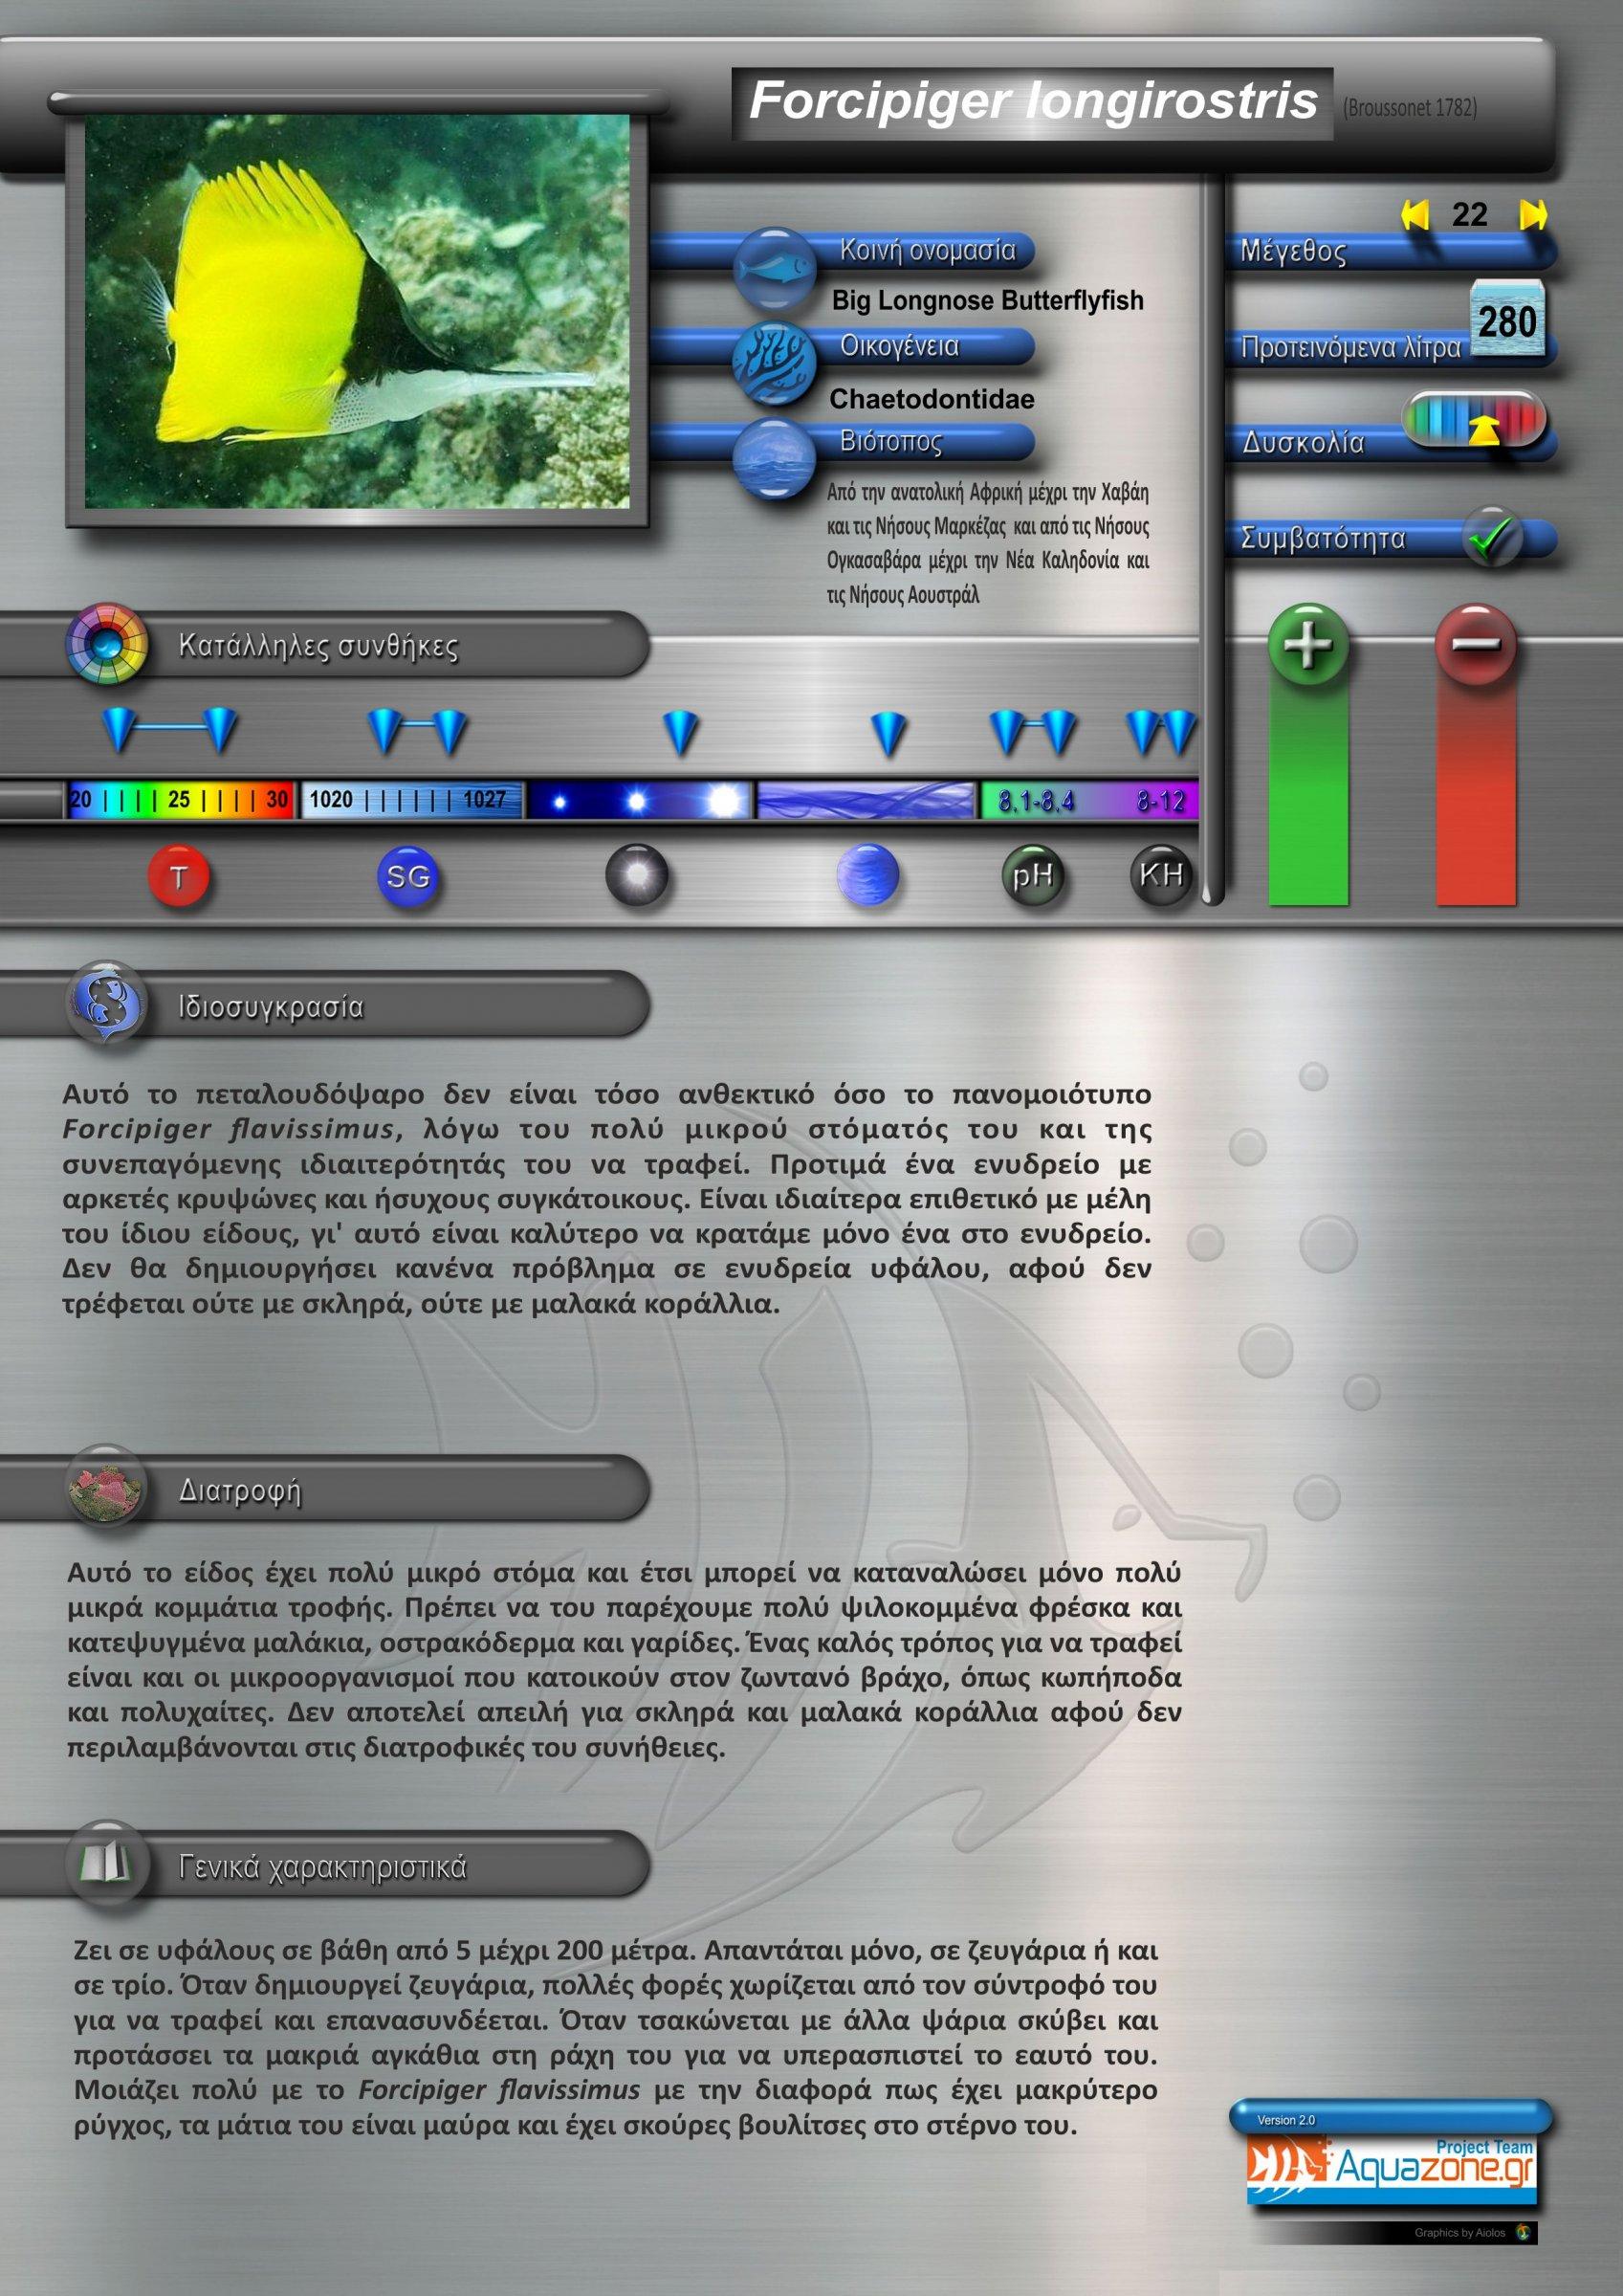 Forcipiger longirostris.jpg